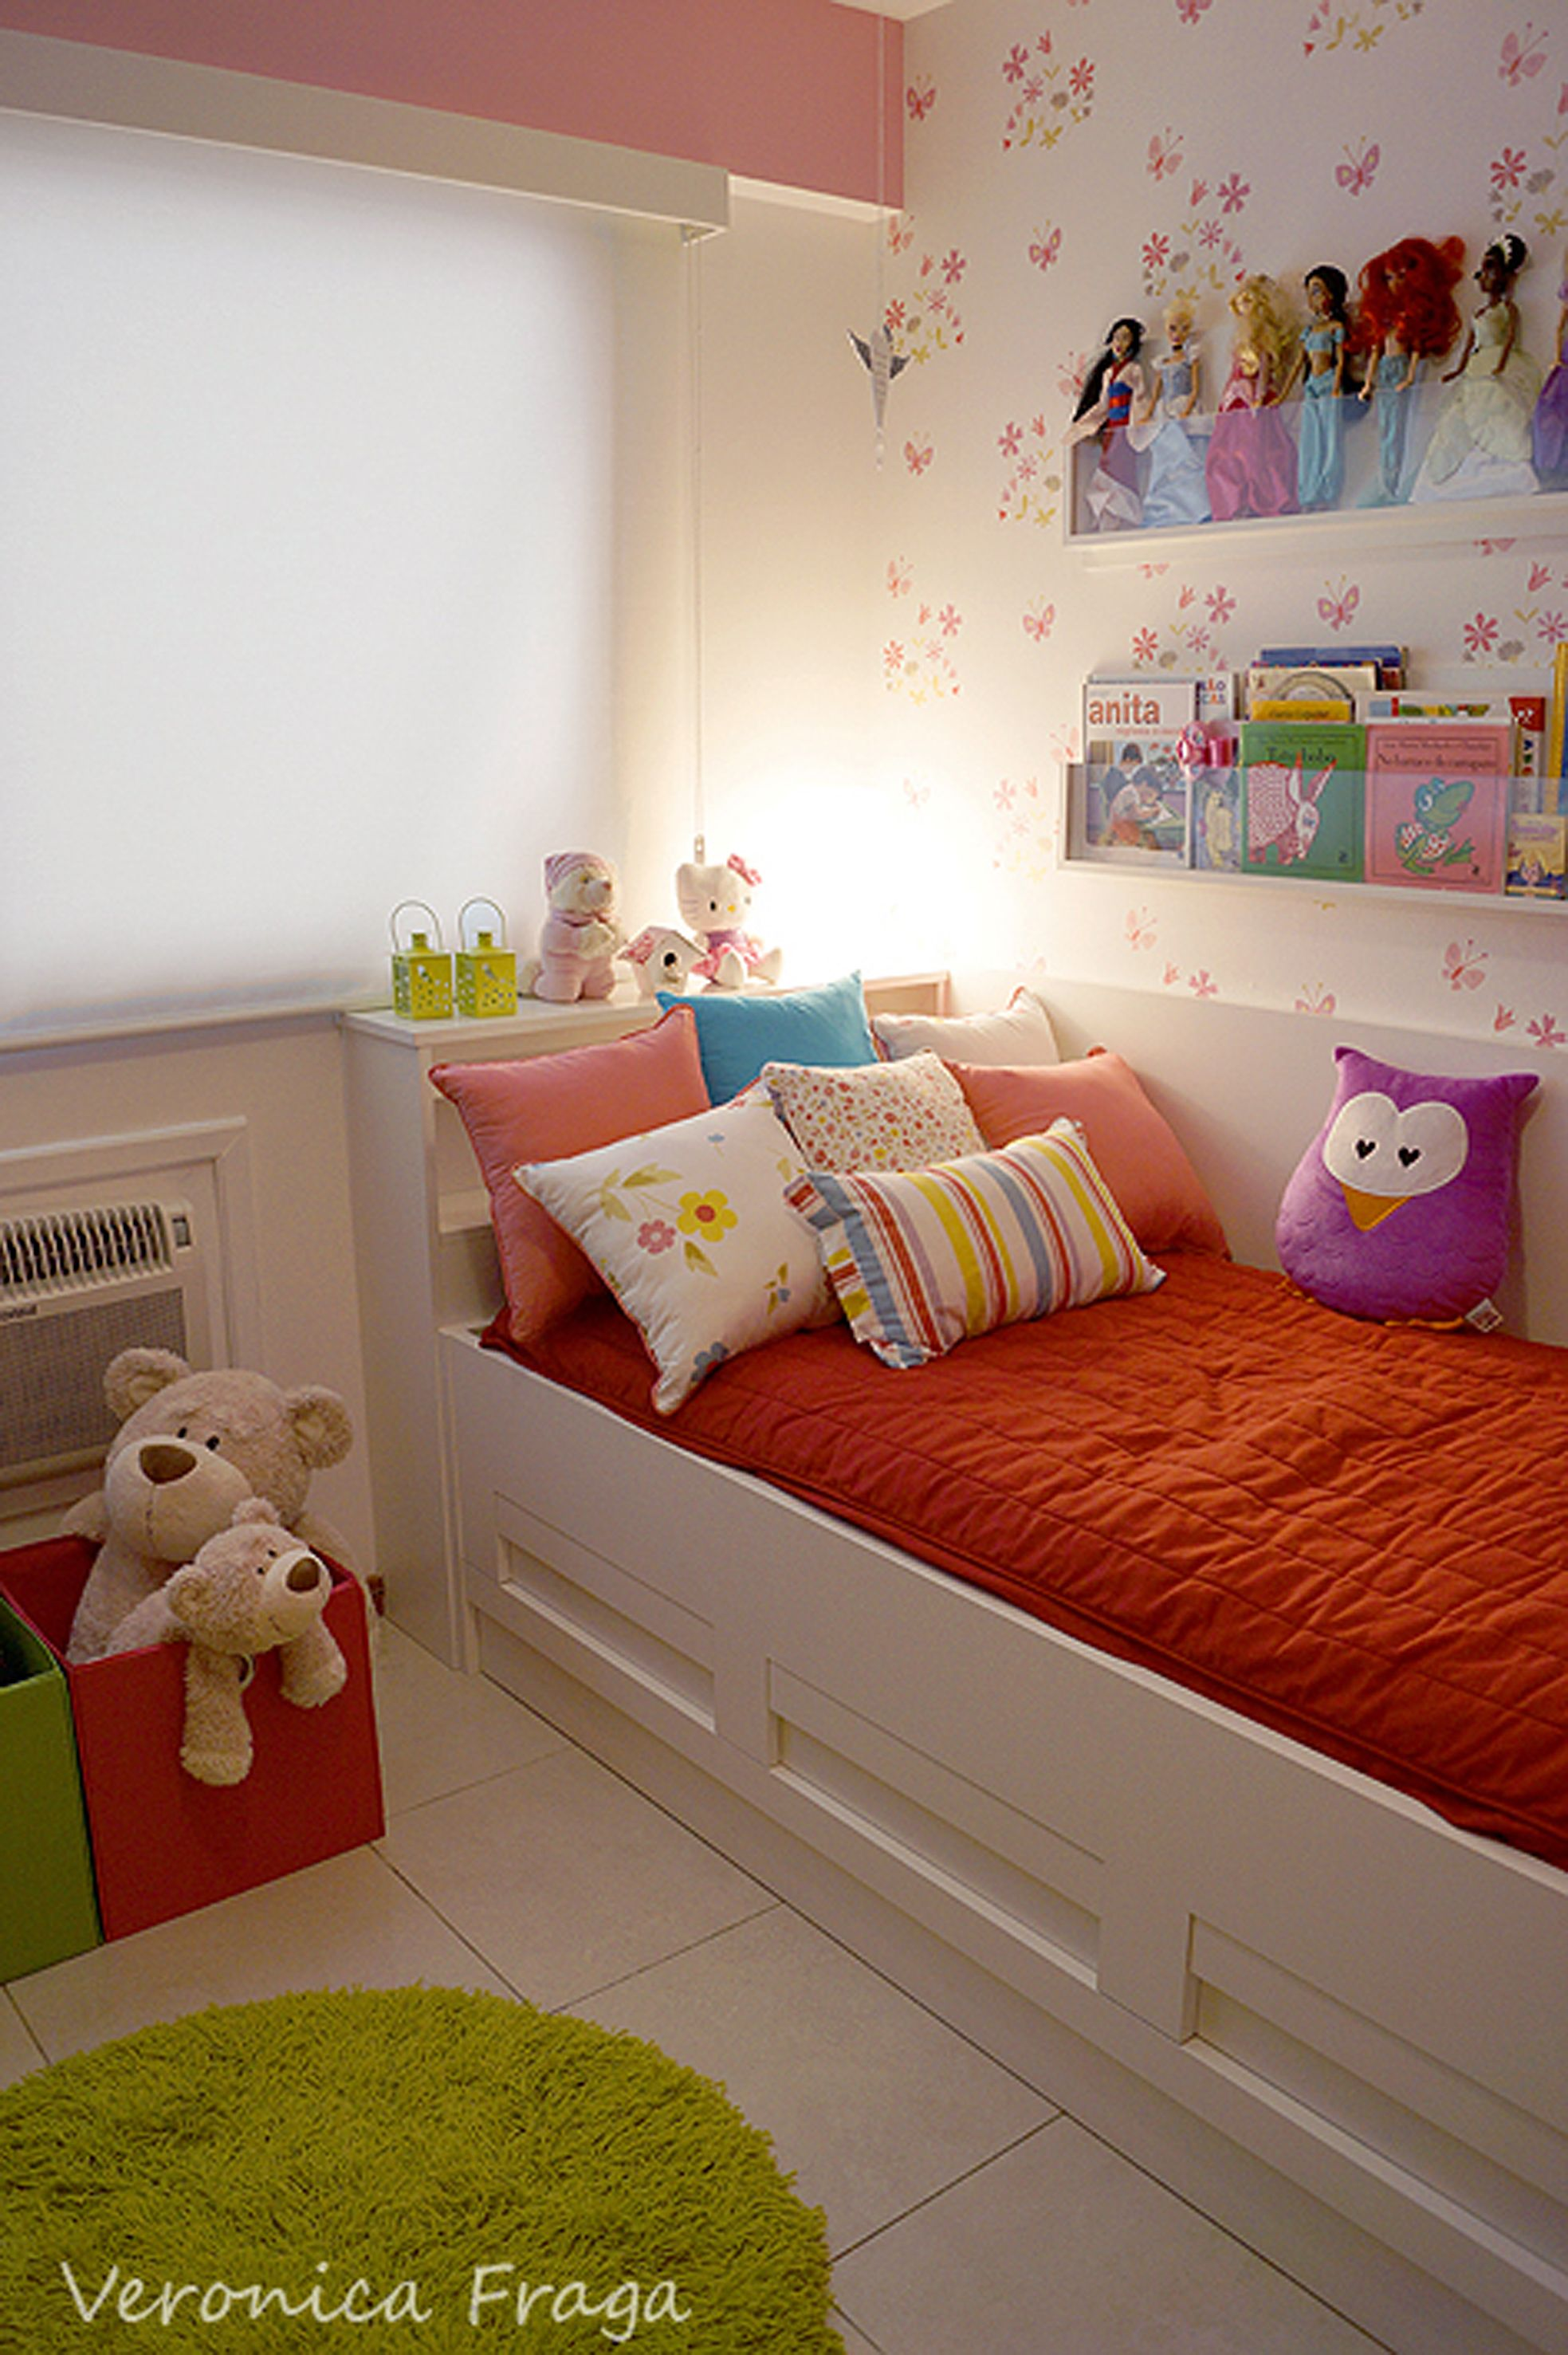 Decora o de quarto de menina feita por mim dormitorios pinterest kinderzimmer deko und - Barbie kinderzimmer ...